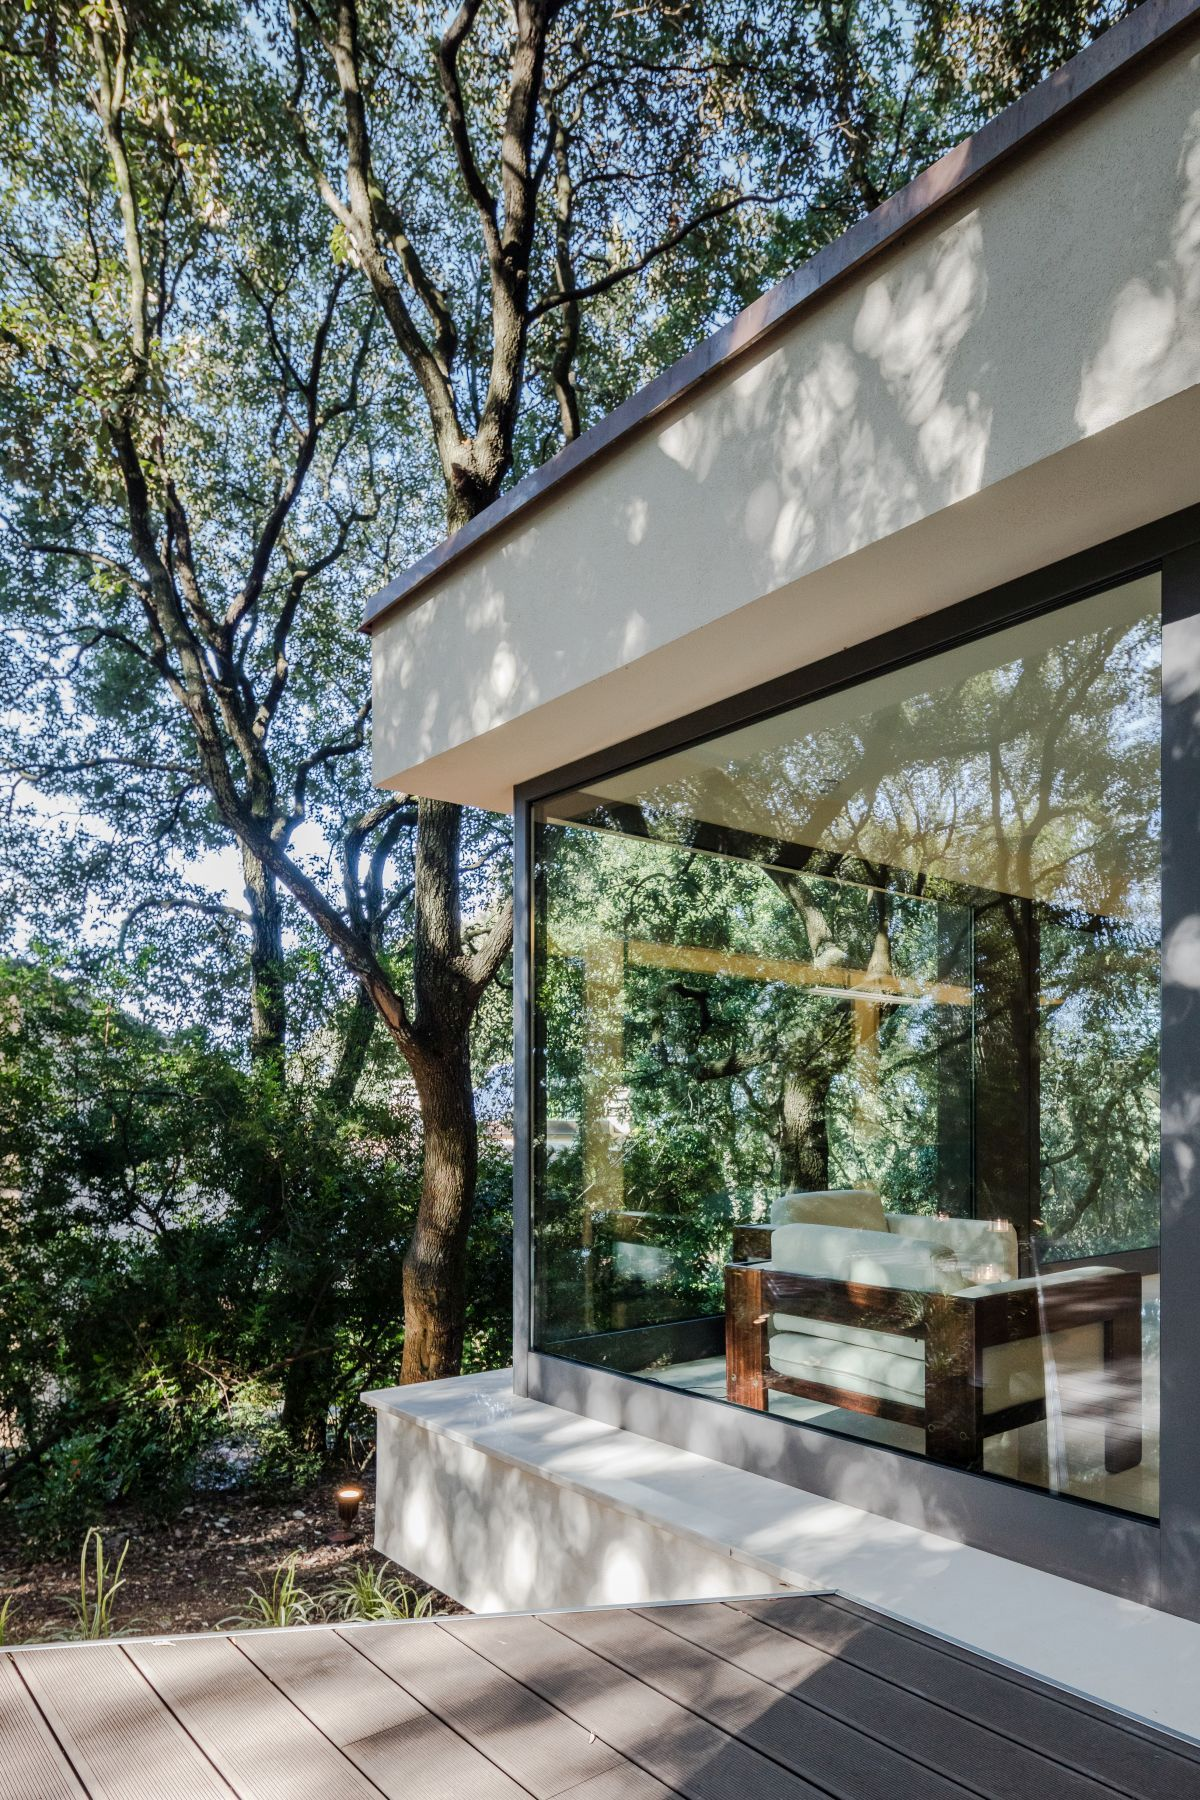 Casa nel Bosco large glass walls around the corner